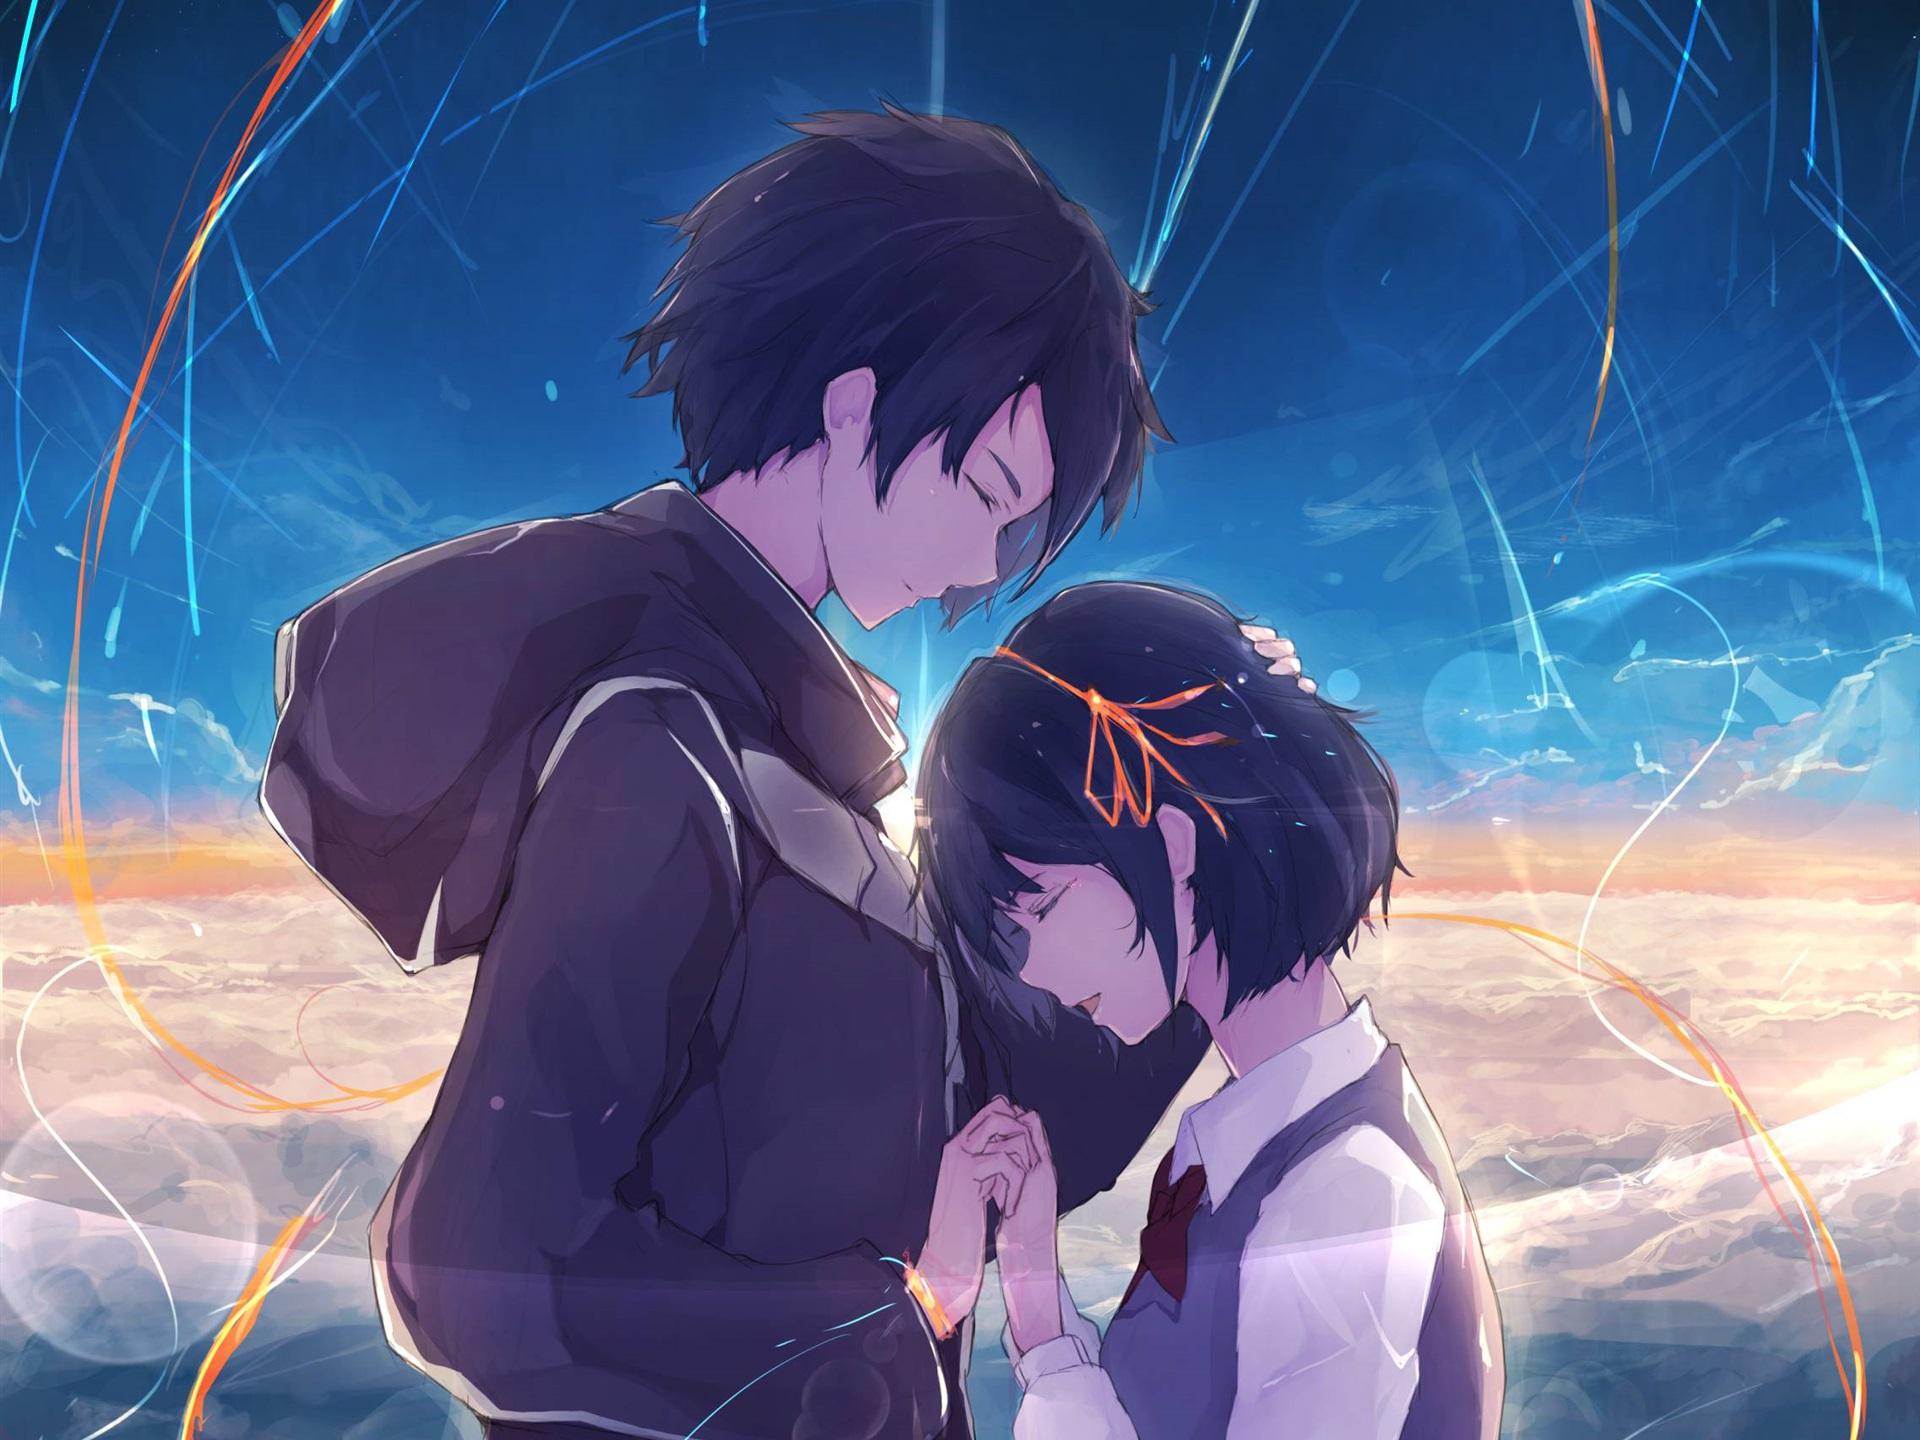 anime manga boy and girl: 배경 화면 너의 이름은., 행복, 소년과 소녀, 애니메이션 1920x1440 HD 그림, 이미지